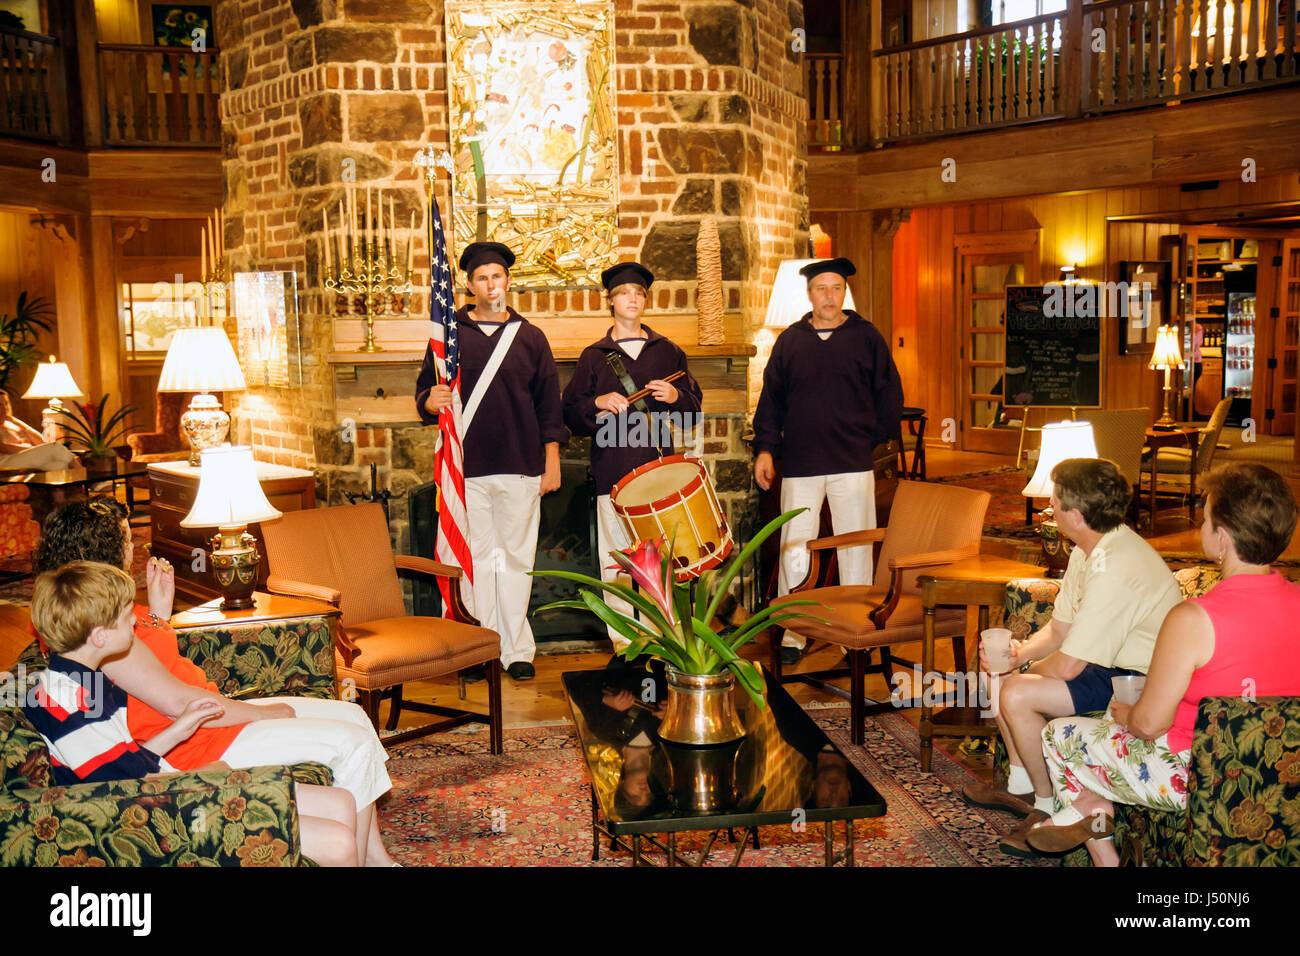 Alabama Al South Baldwin County Point Clear Grand Hotel Marriott Stock Photo Alamy